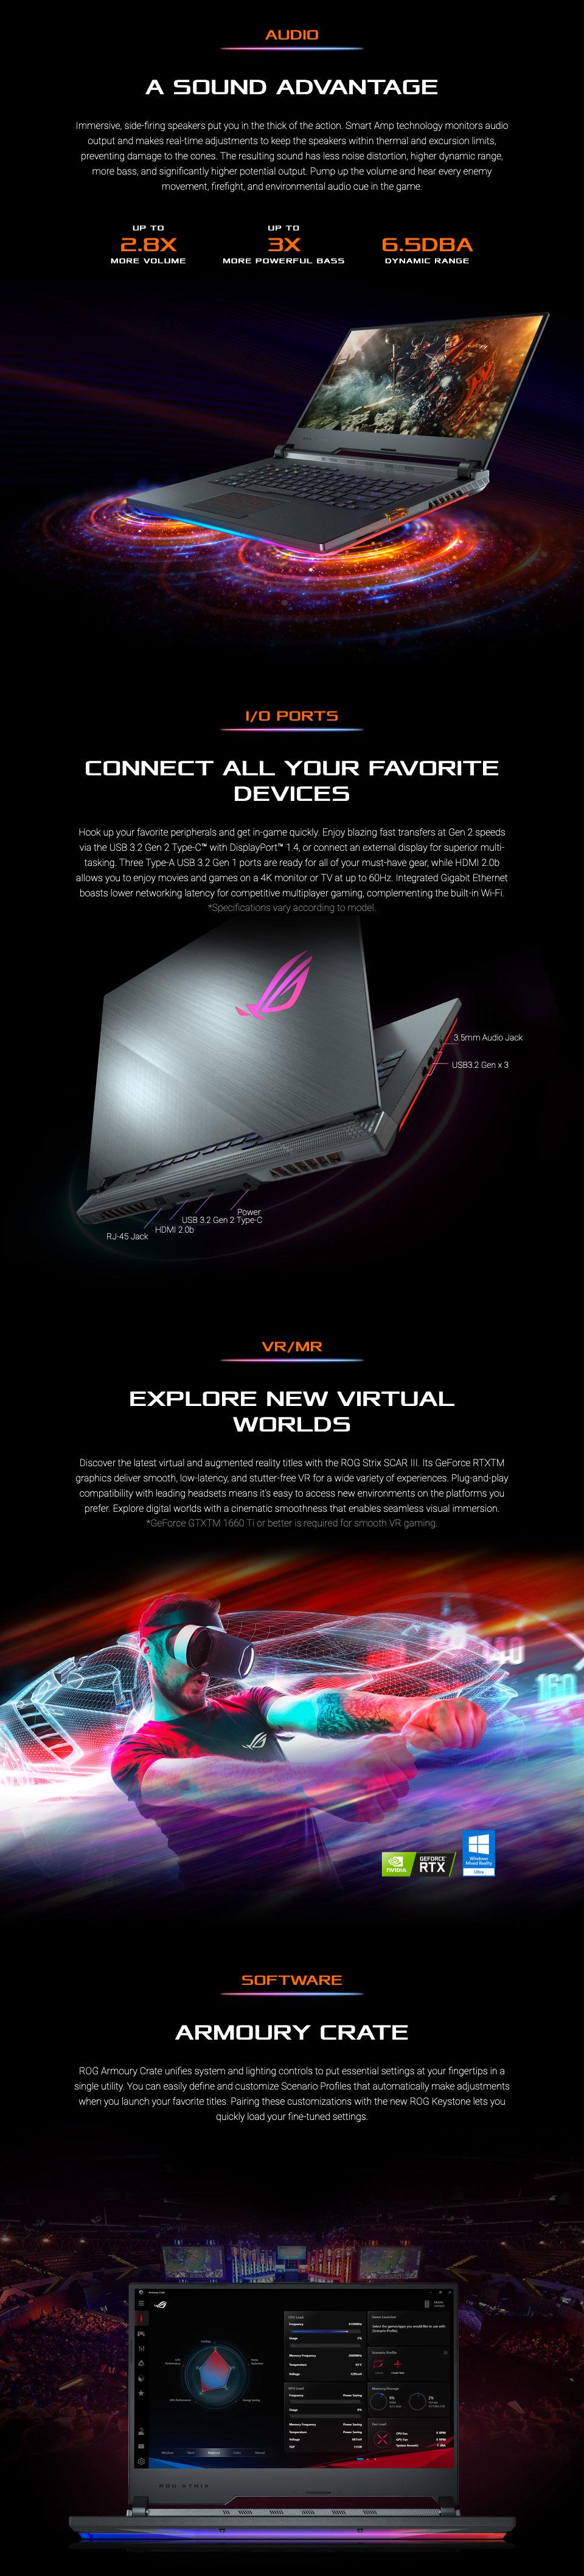 ASUS Strix Scar III Core i7 GeForce GTX 1660 Ti 15 6in Notebook